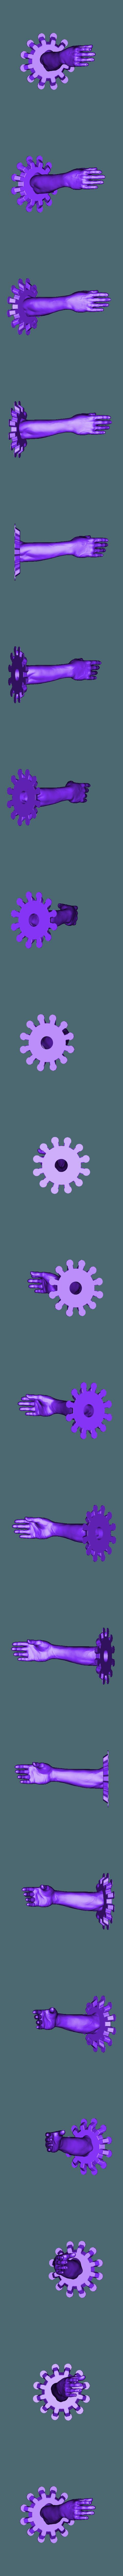 Avant bras homme pour impress.stl Download free STL file The arm of destiny. • 3D printing template, Alienmaker